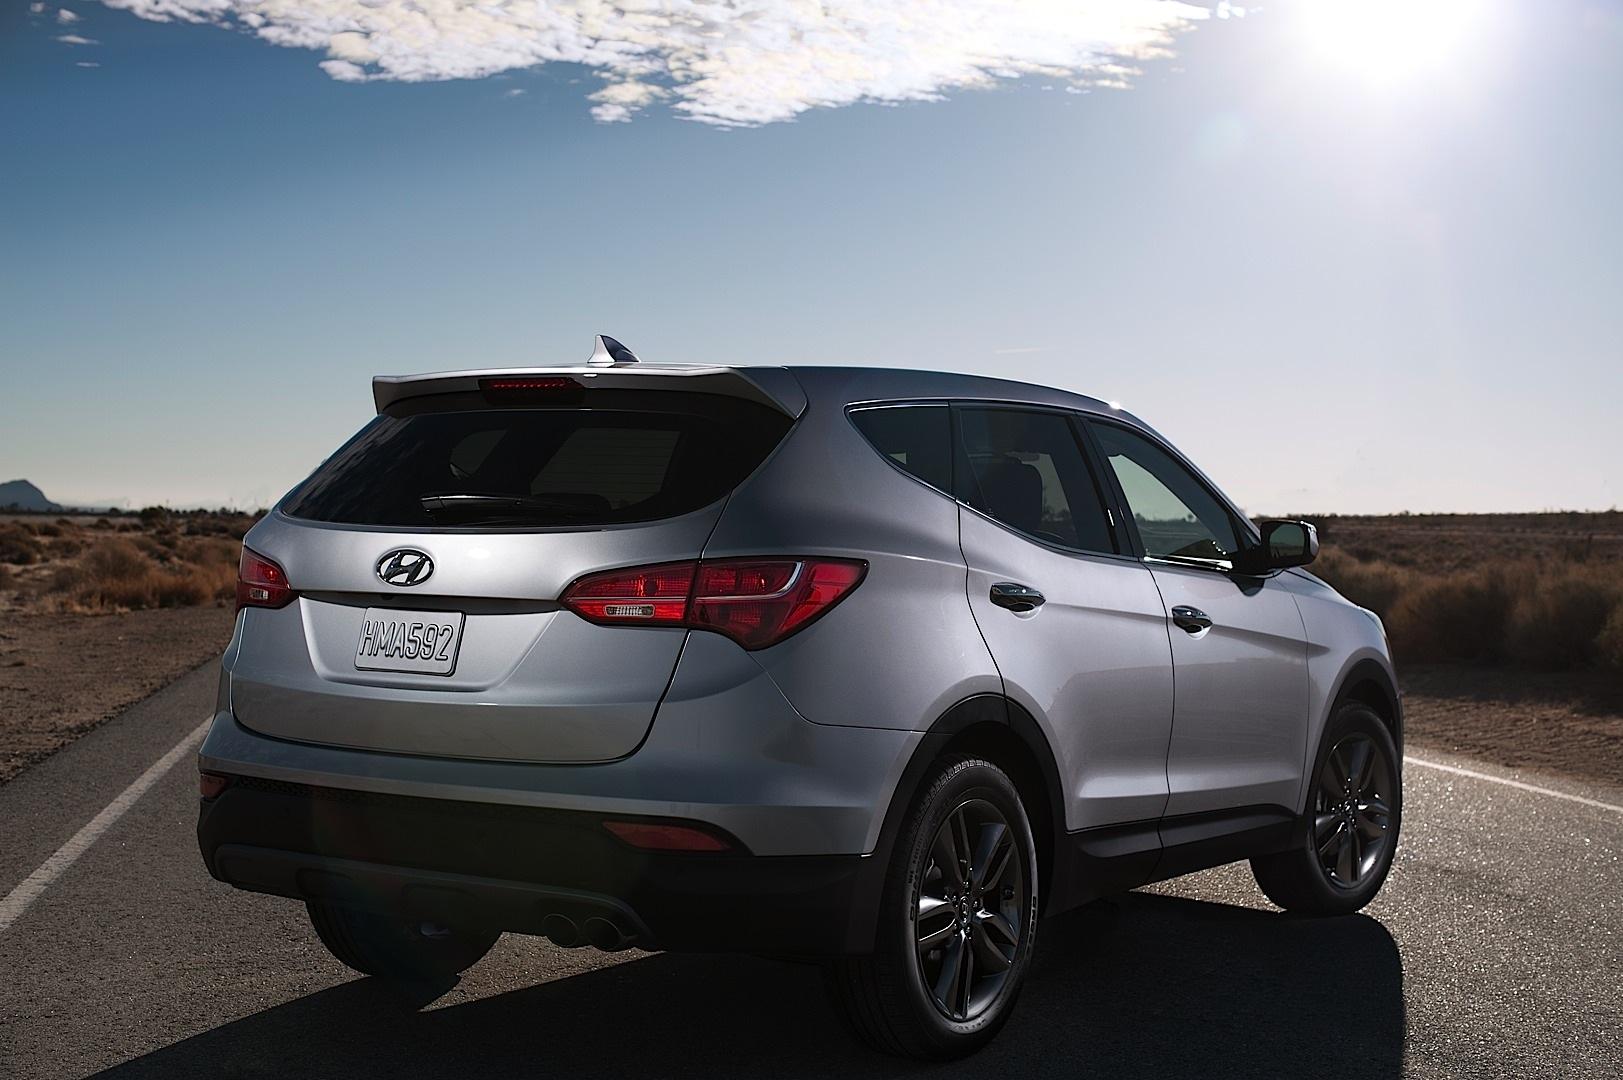 2013 Hyundai Santa Fe Sport Ix45 Revealed Autoevolution